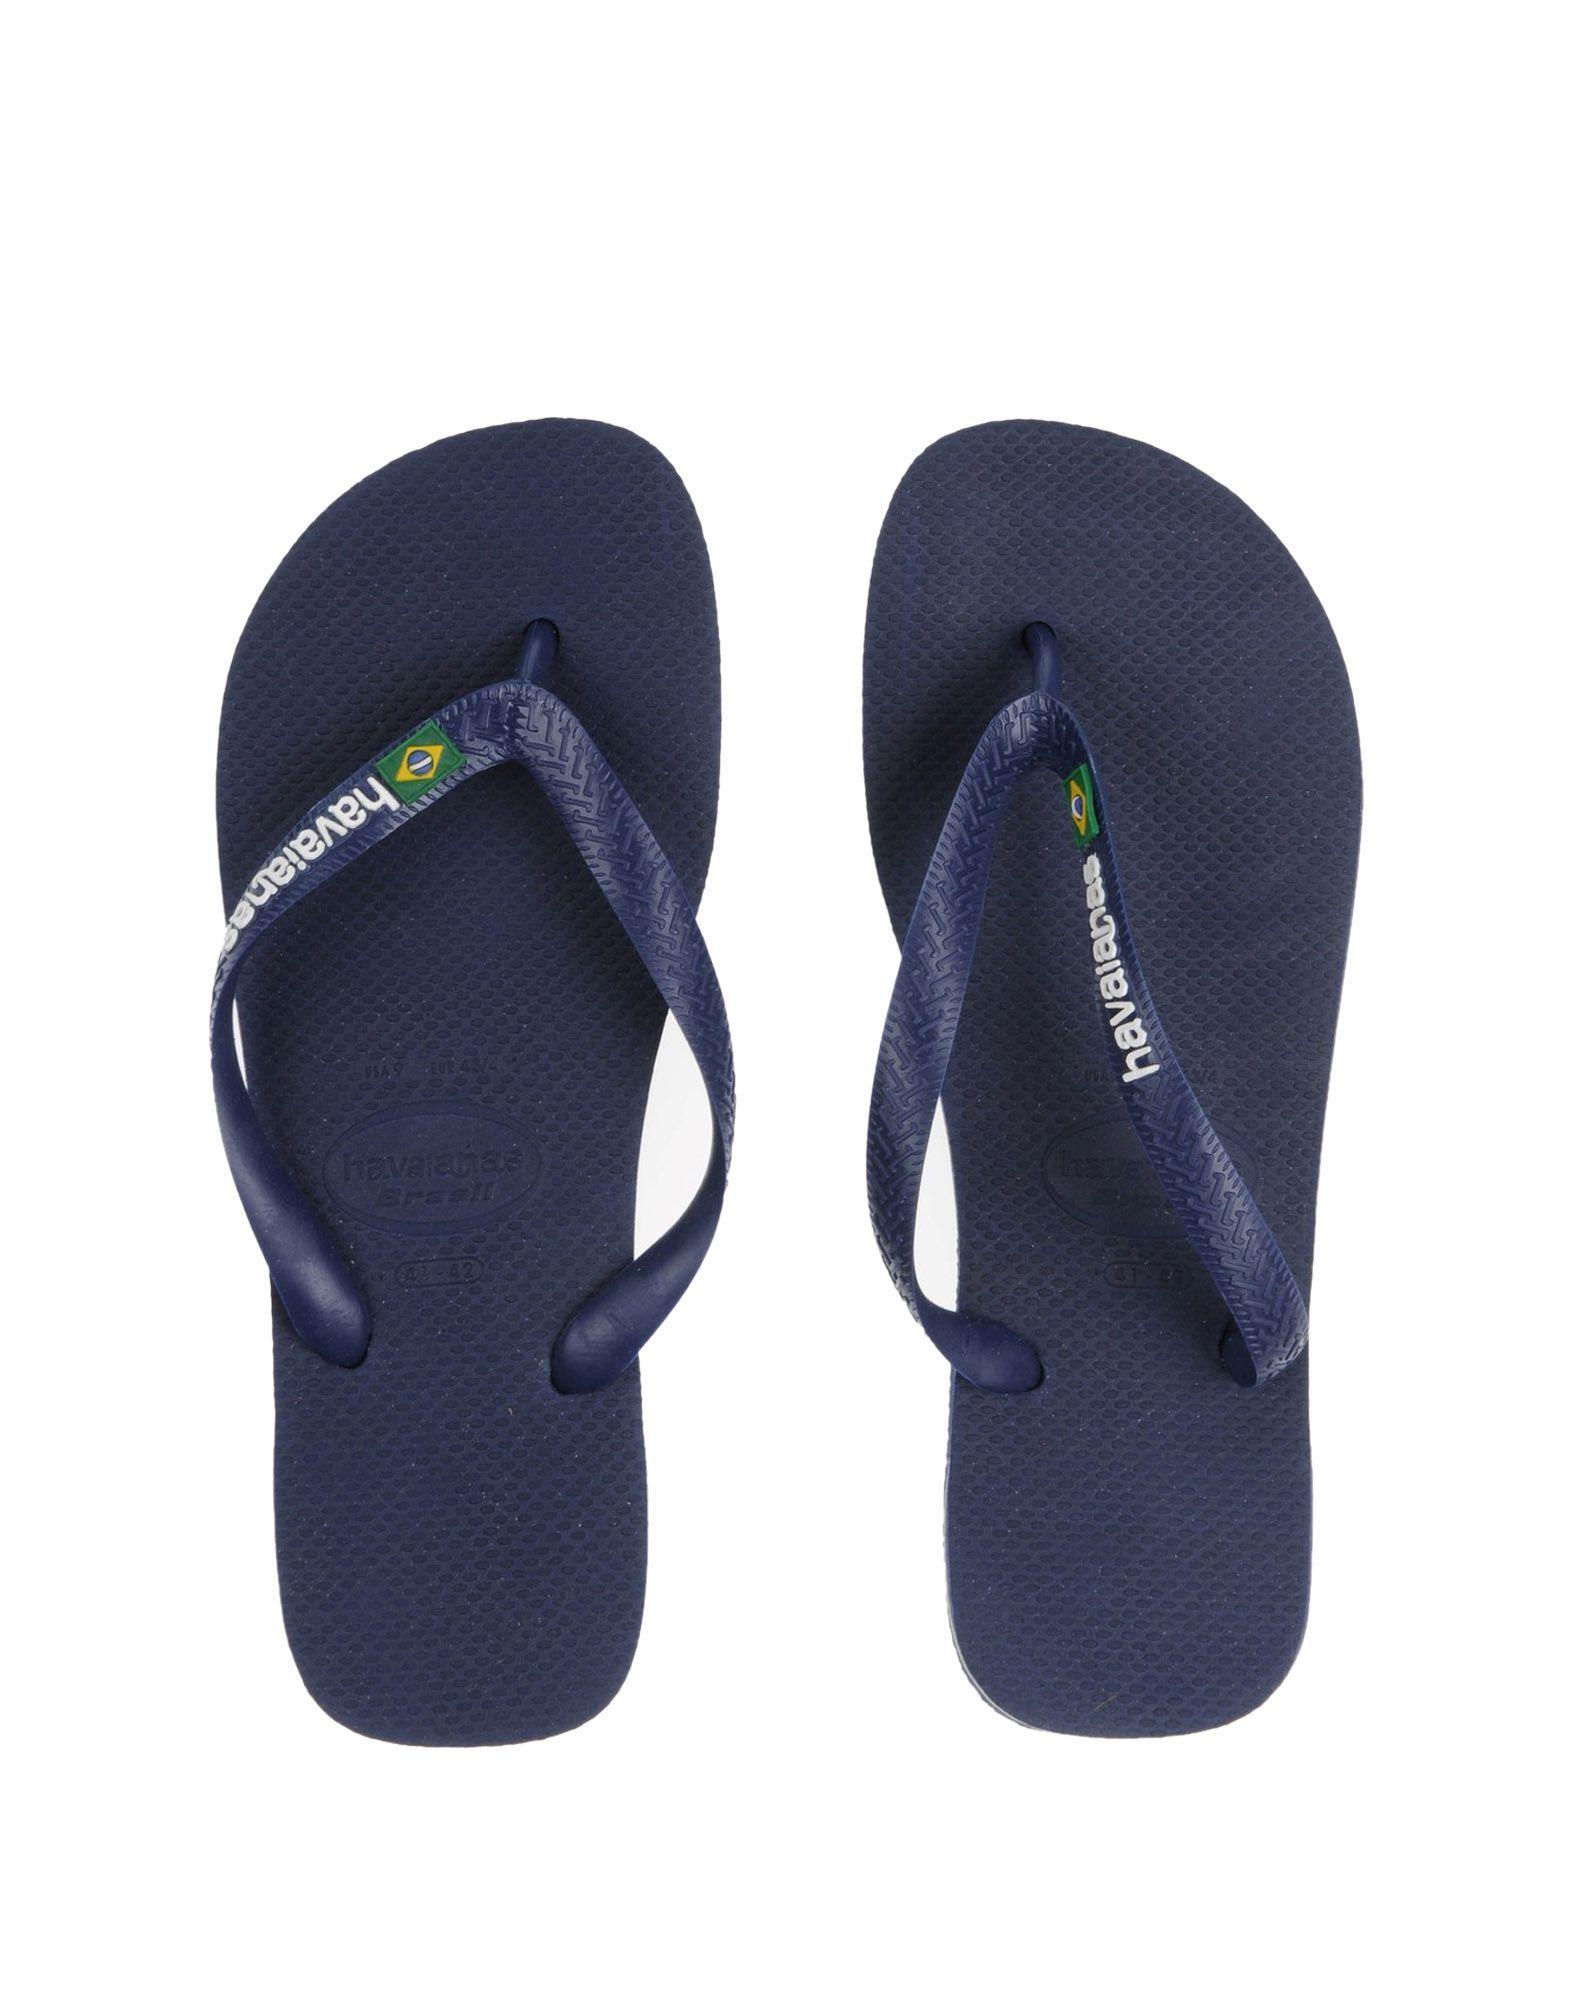 72b63ab07aa4a  havaianas  shoes  . HAVAIANAS .  havaianas  shoes   Havaianas Mens